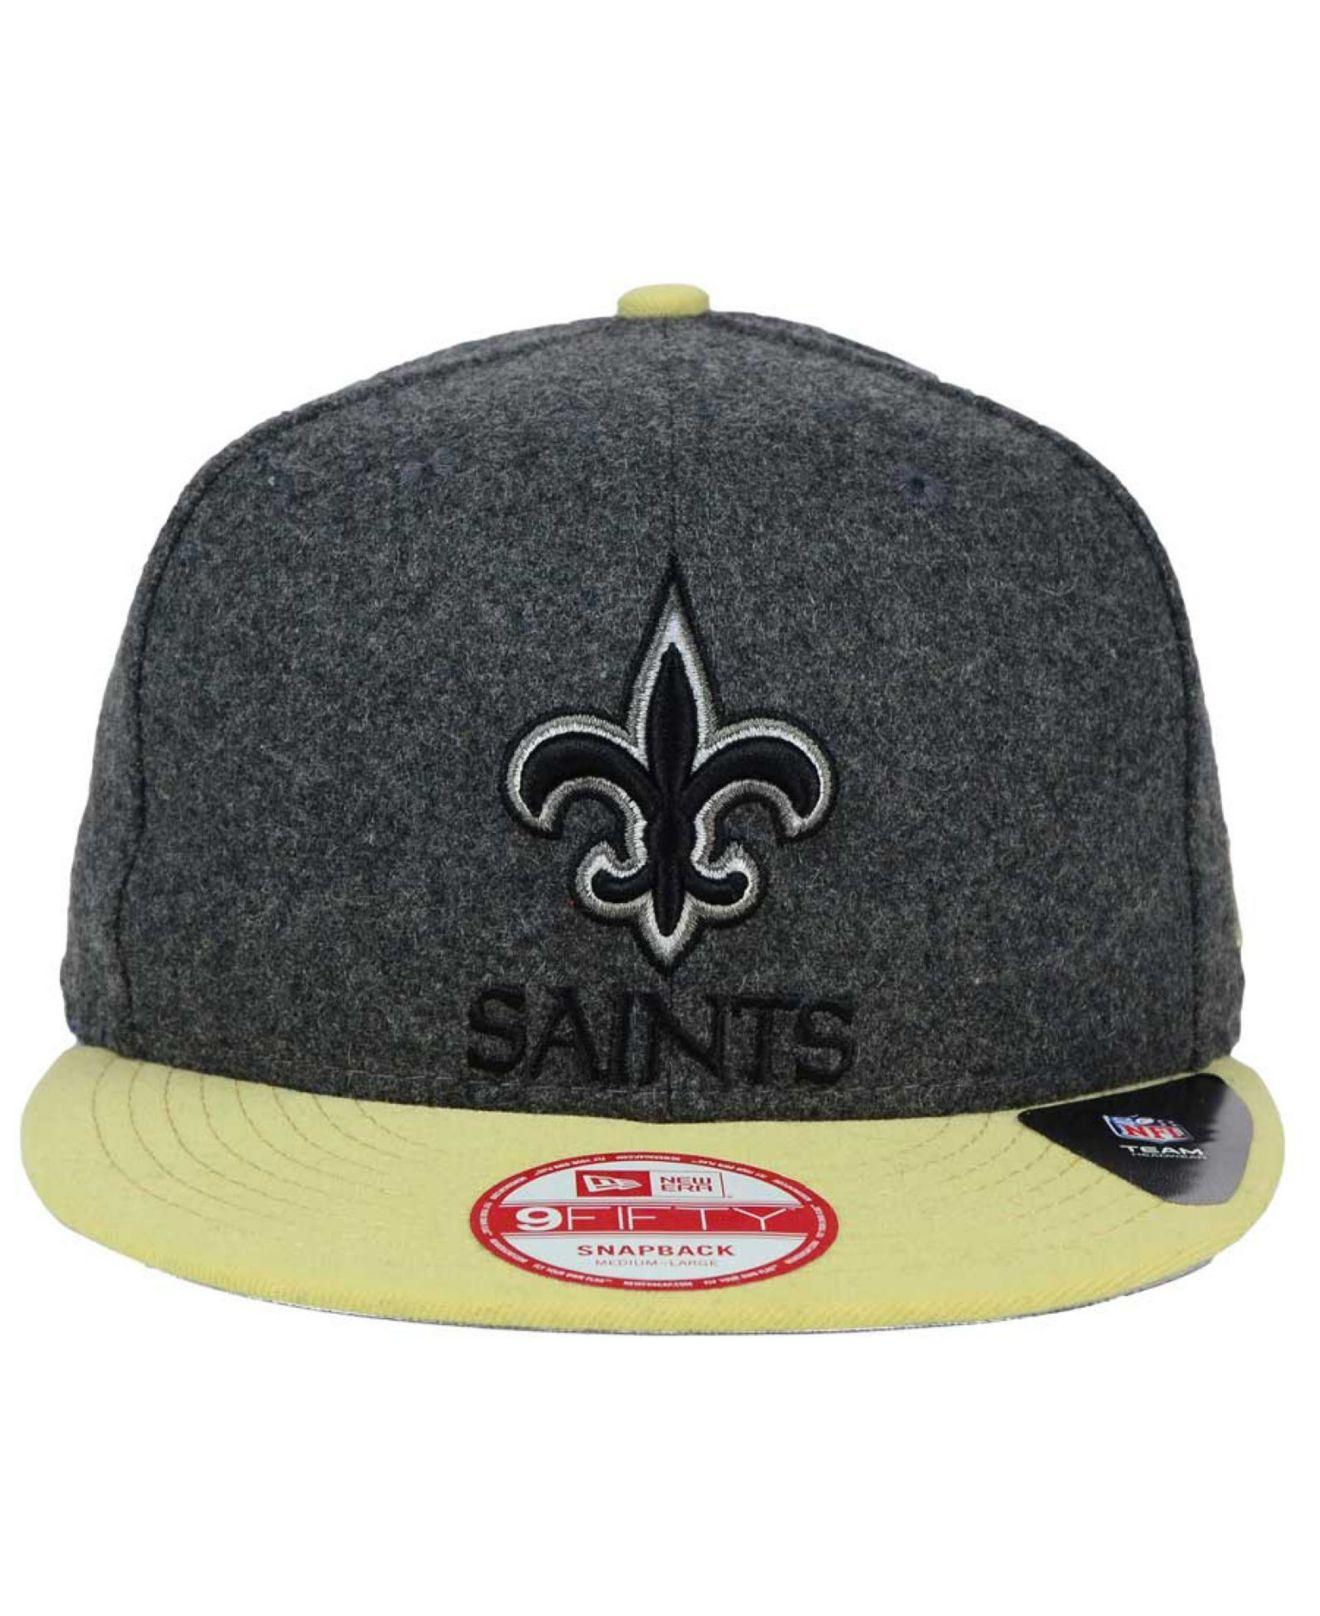 promo code 68ade 01ba1 Lyst - KTZ New Orleans Saints Shader Melt 9fifty Snapback Cap in ...